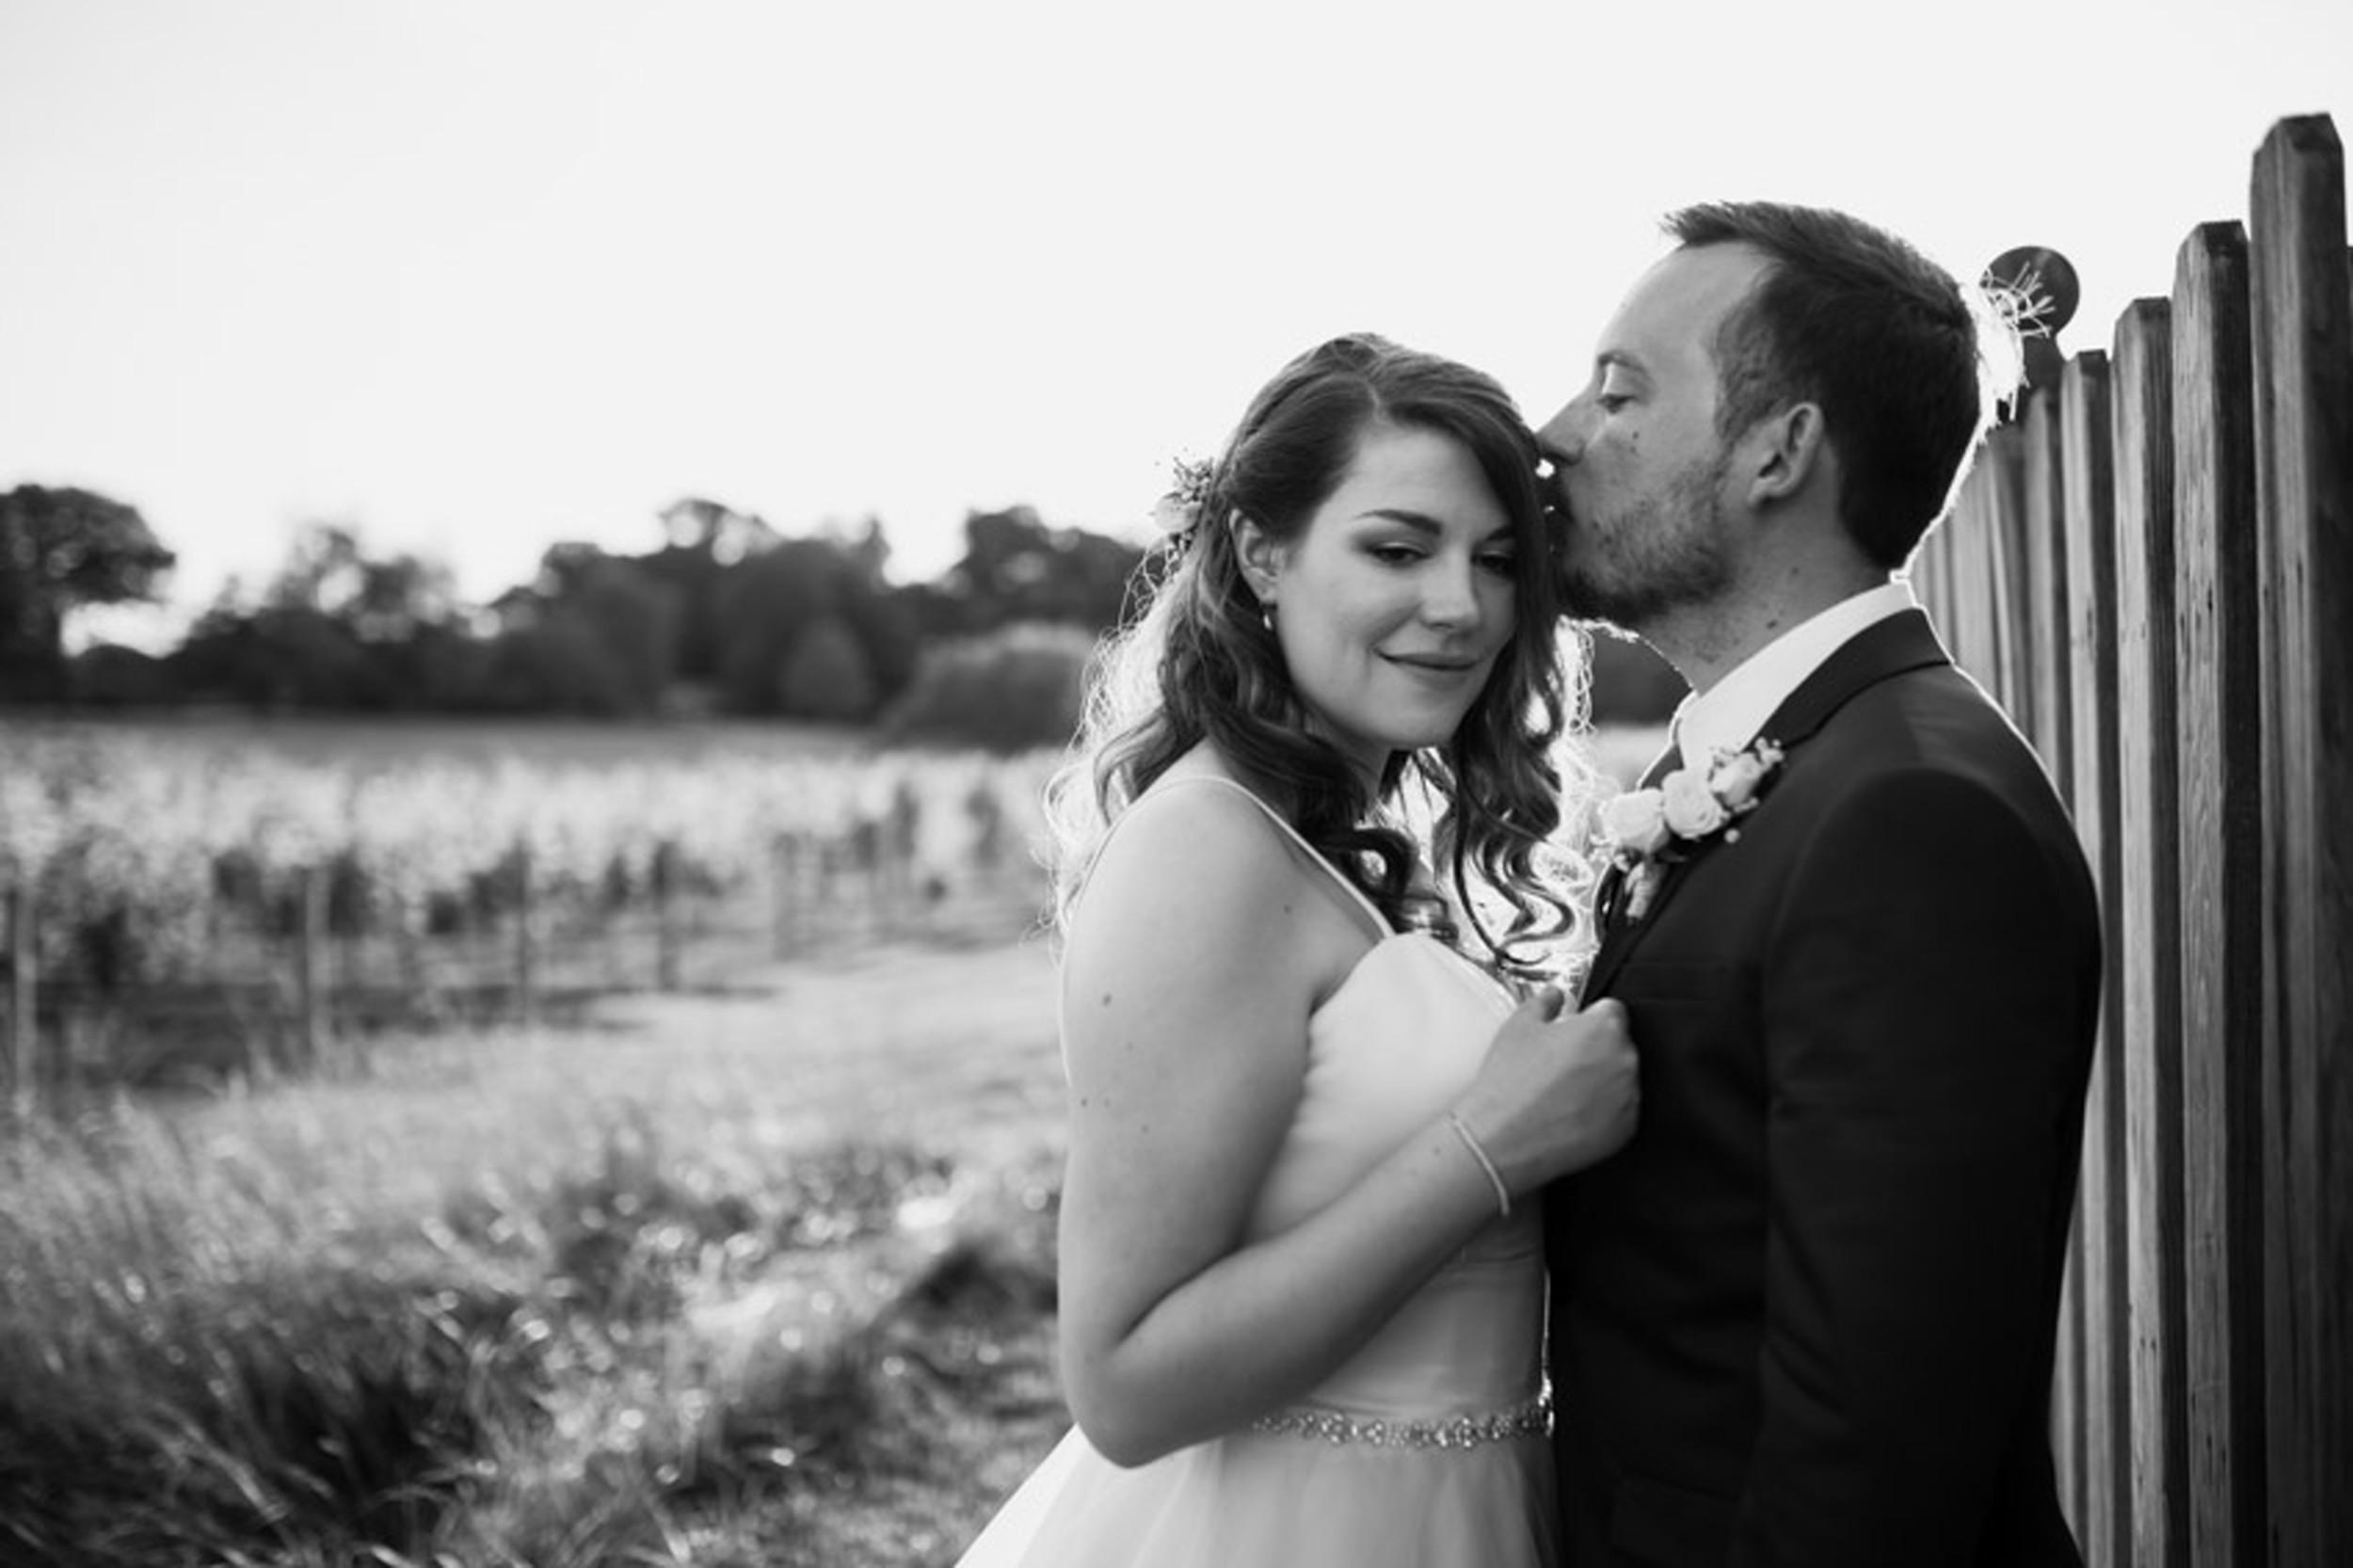 Romantic Winery Wedding Kiss